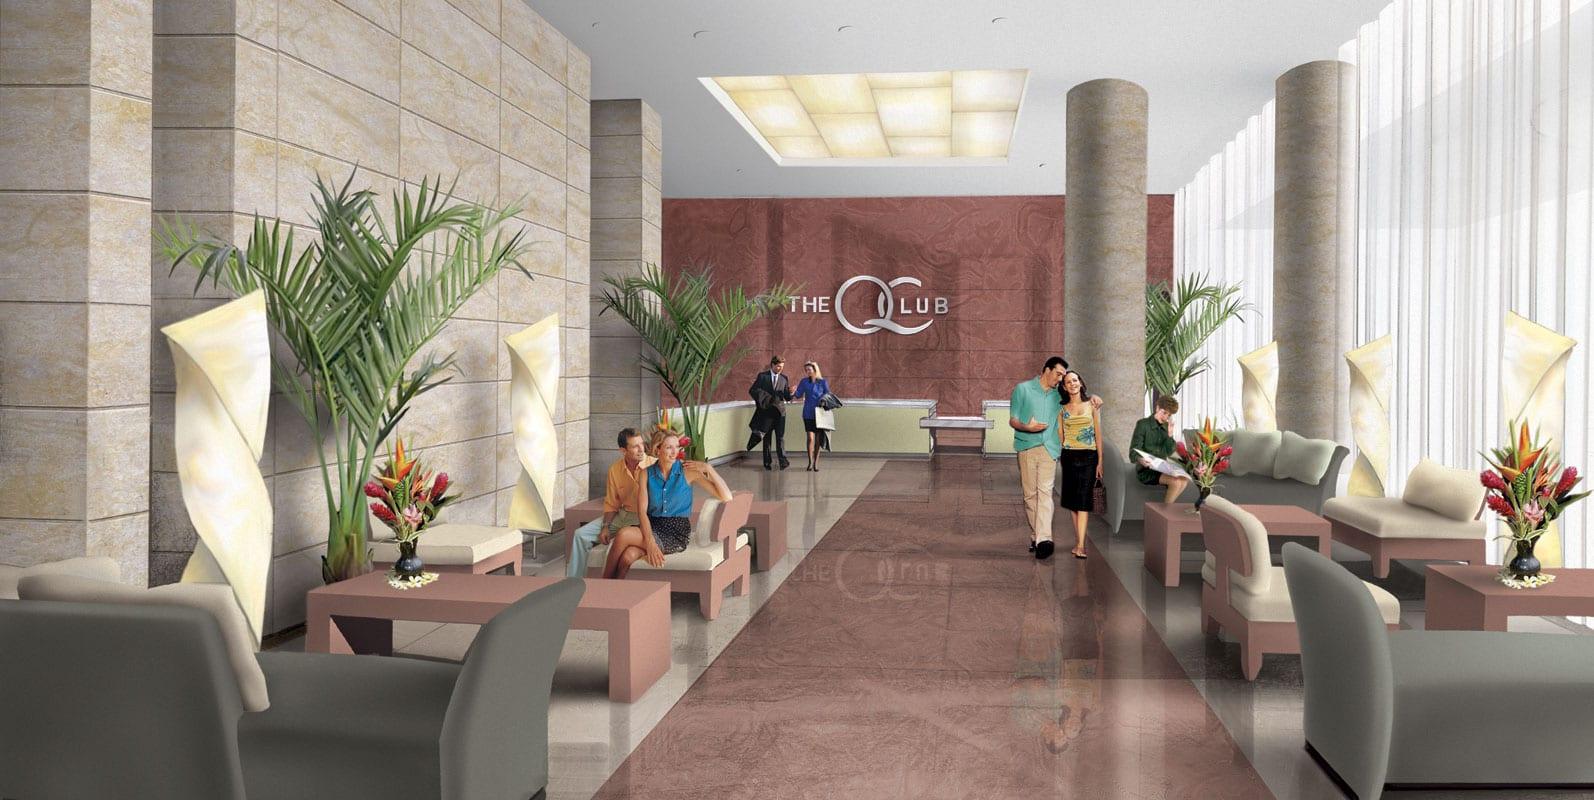 Q Club Resort Product Shots